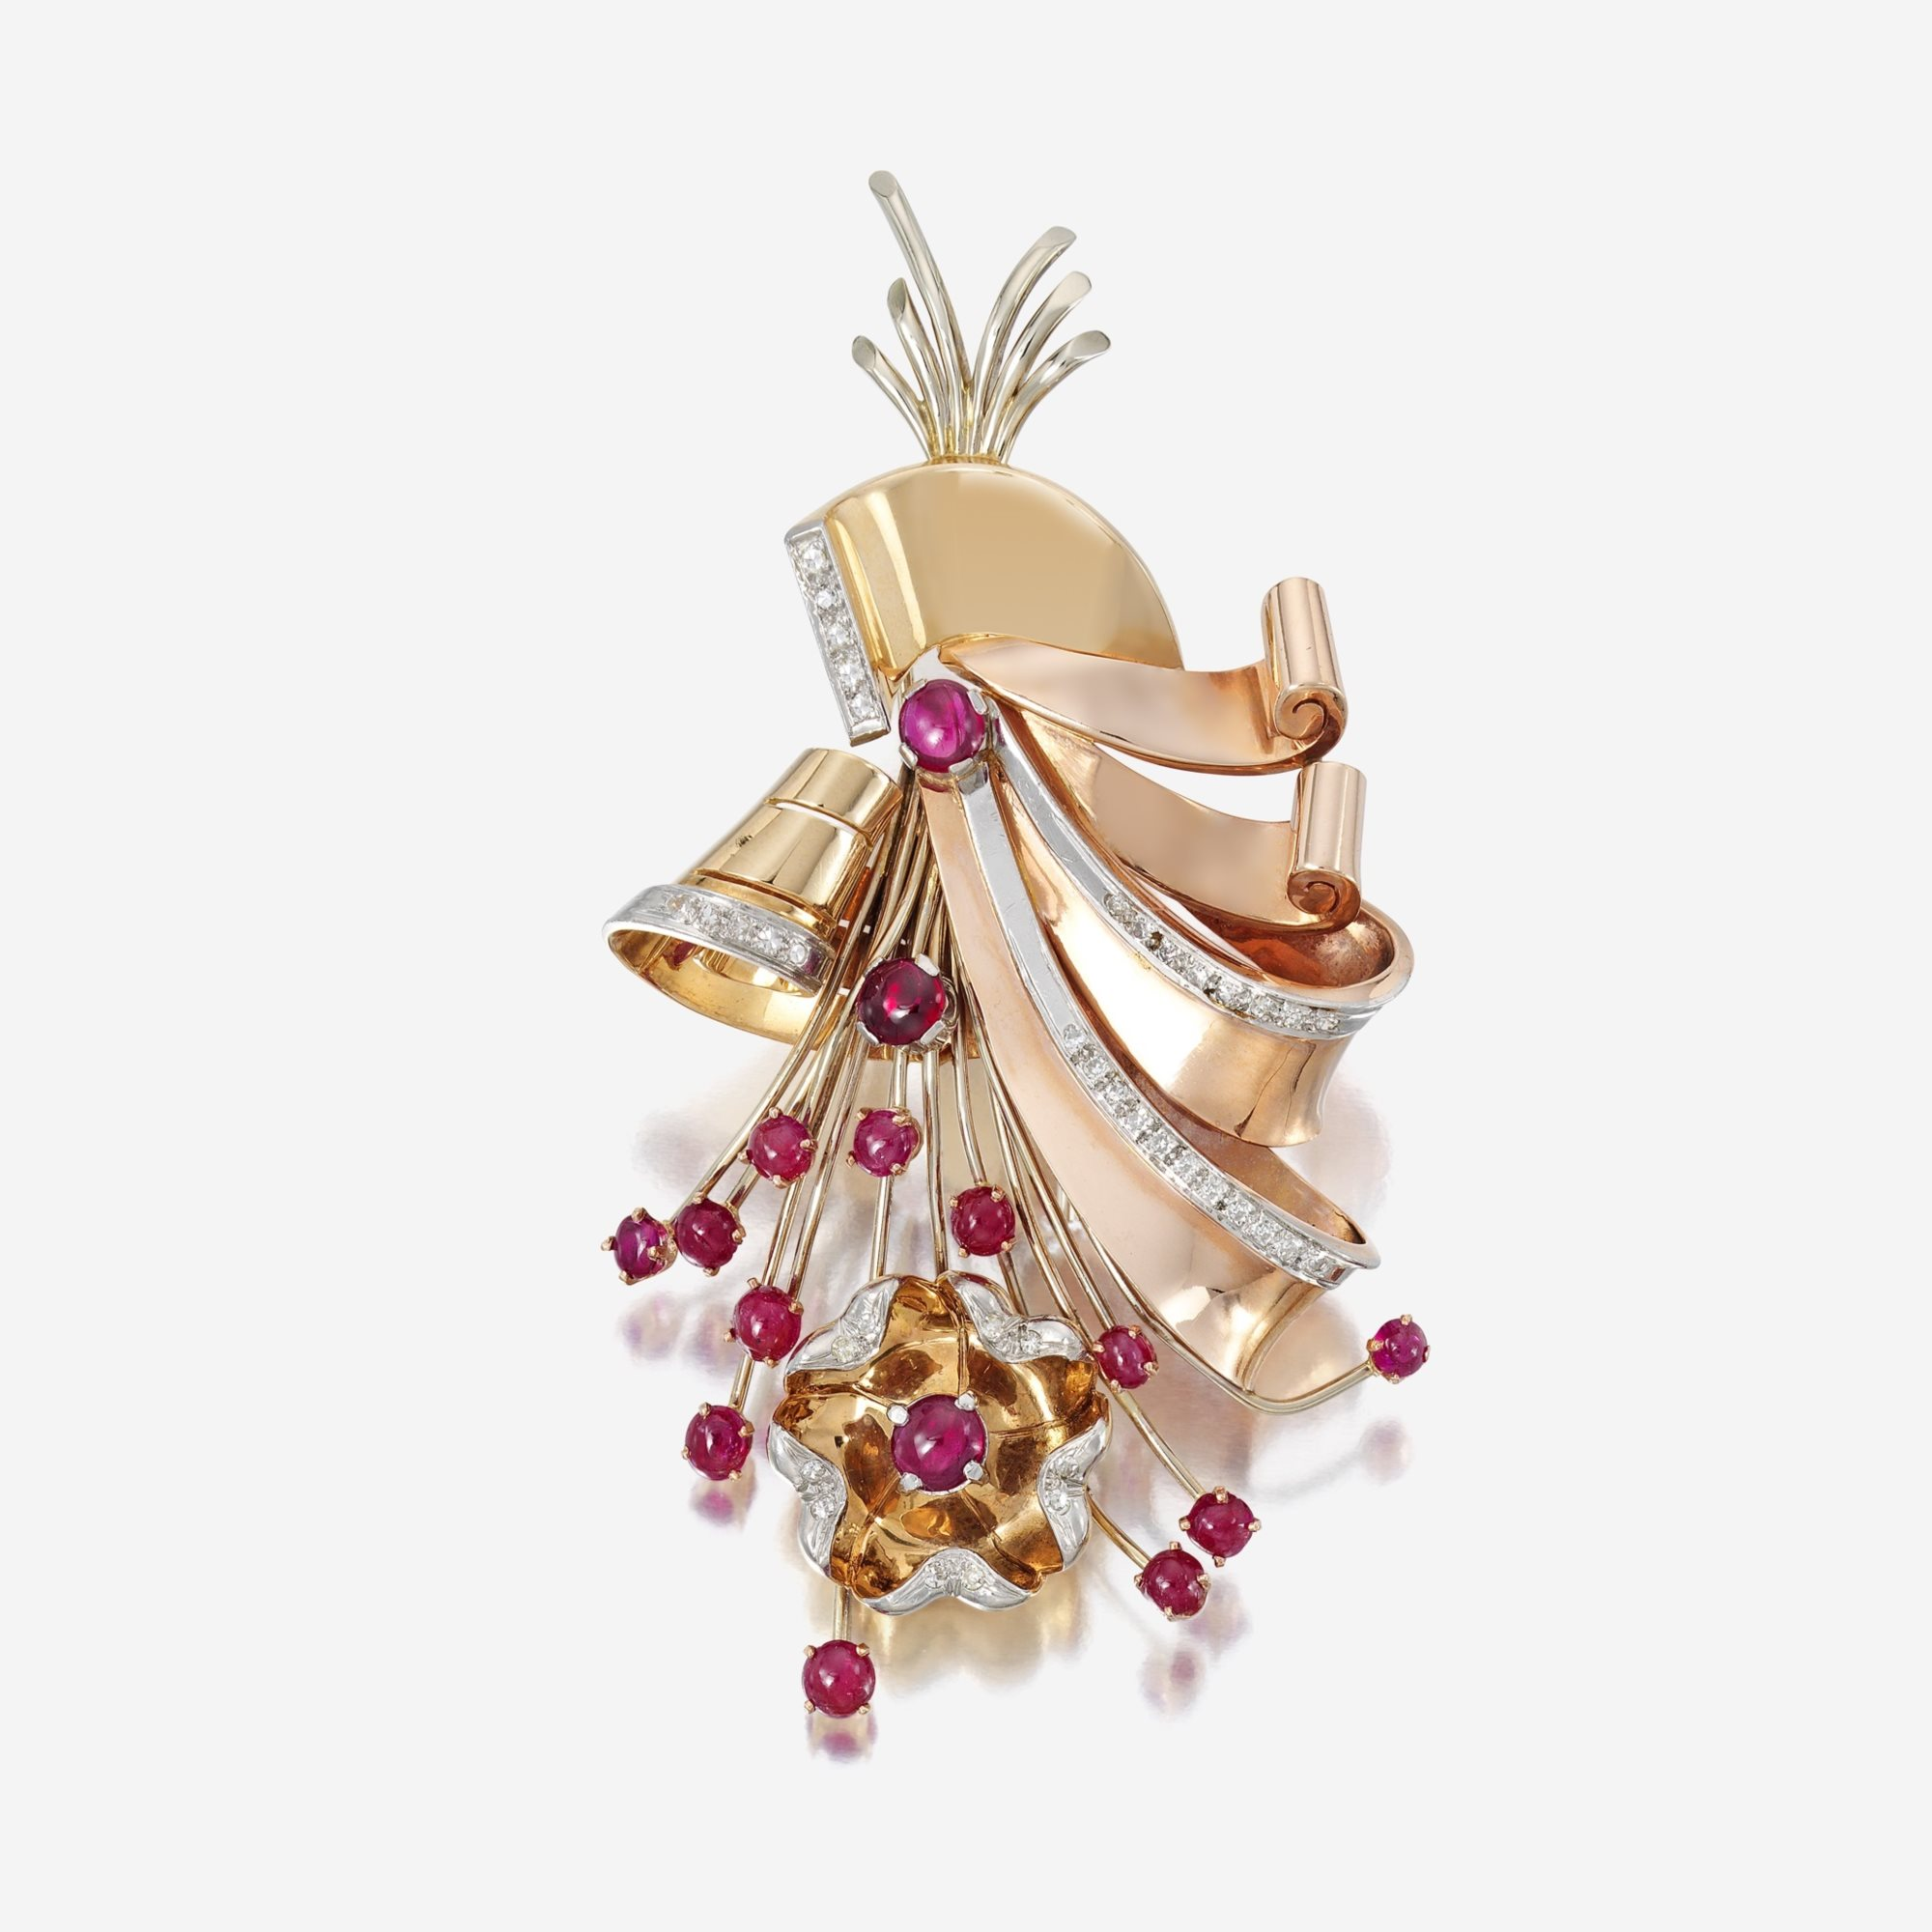 A Retro fourteen karat bicolor gold, ruby, and diamond brooch